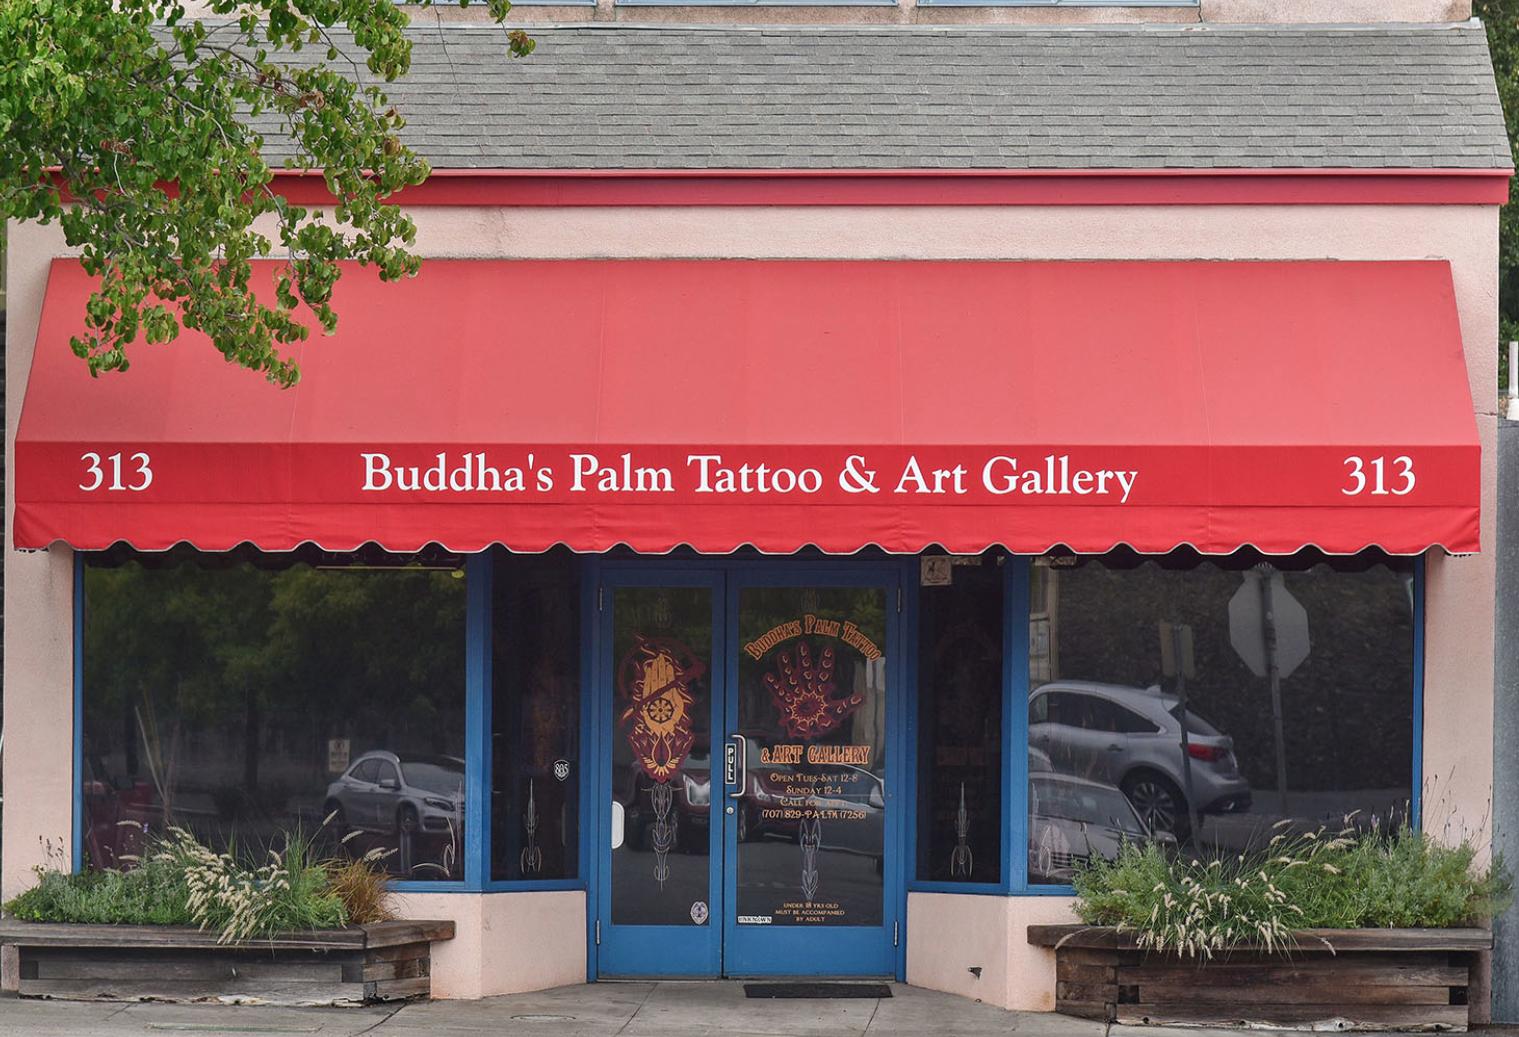 Buddha's Palm Tattoo & Art Gallery